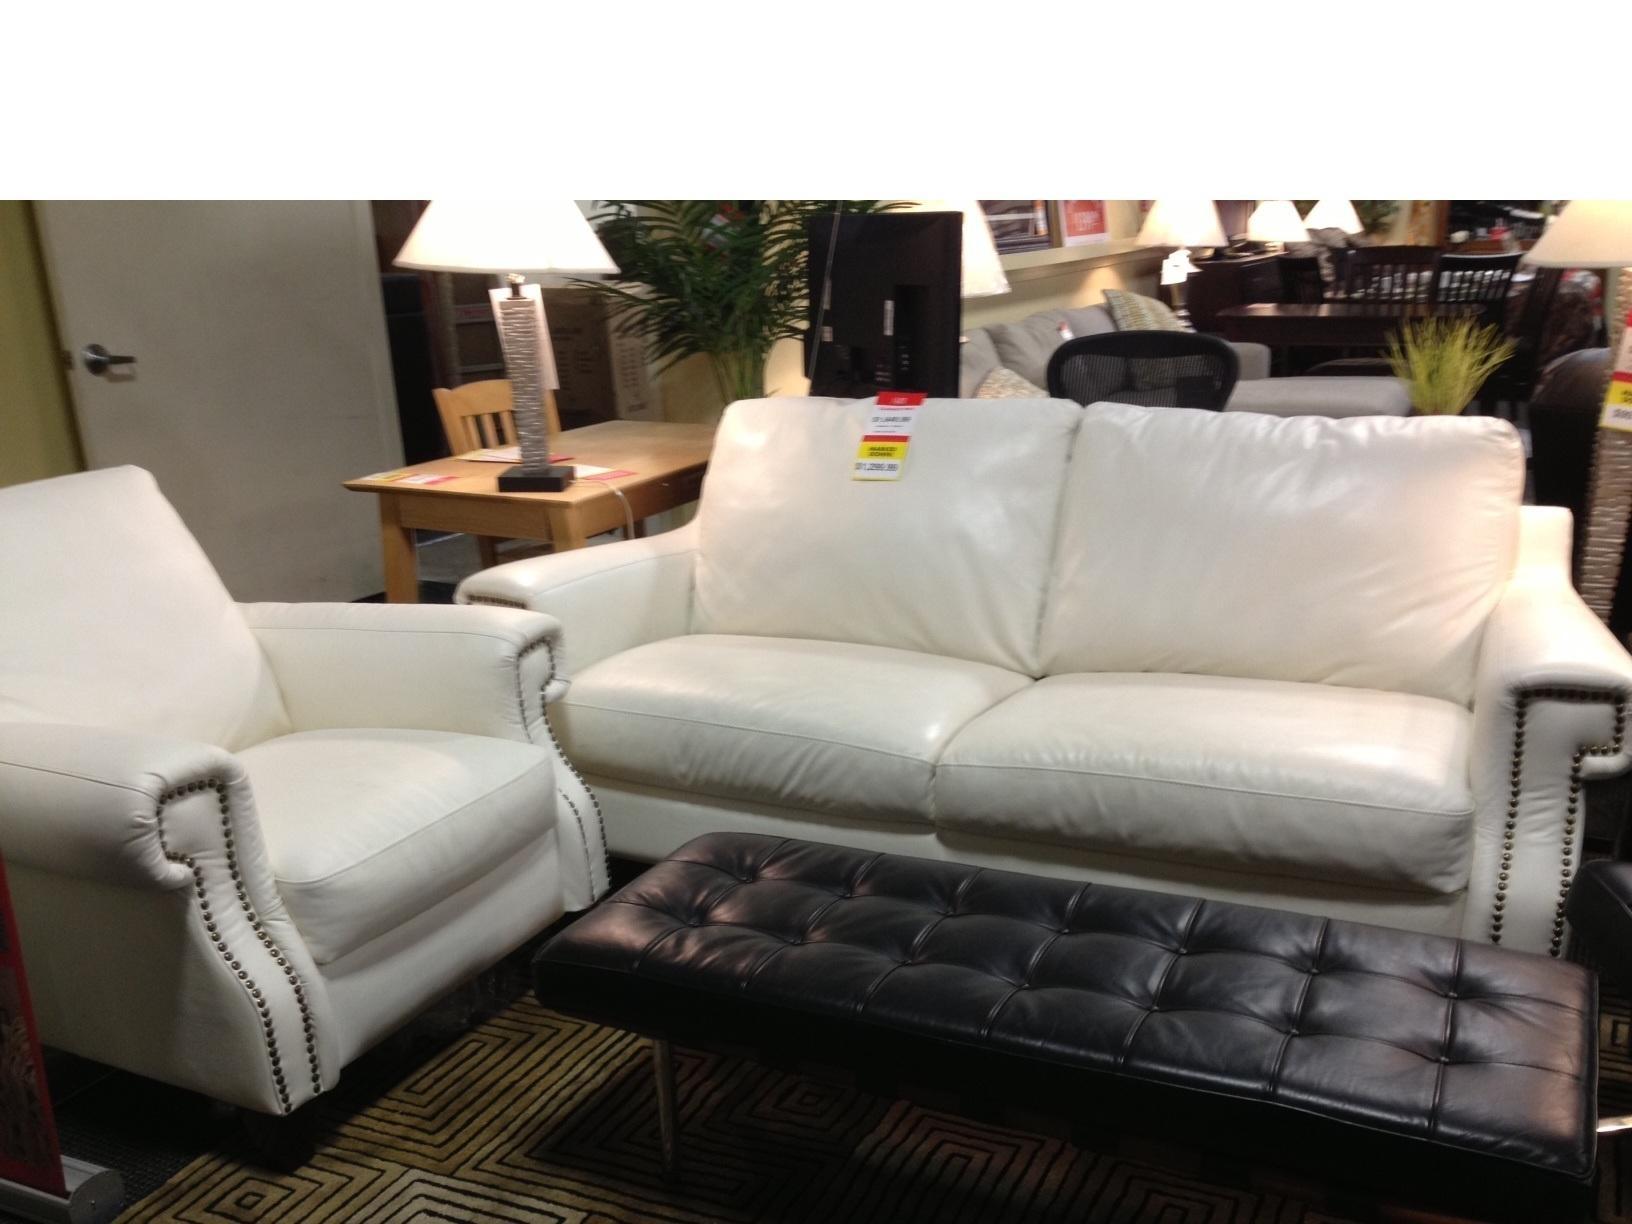 leather sofa richmond hill designer white slipcover 20 collection of sofas ideas